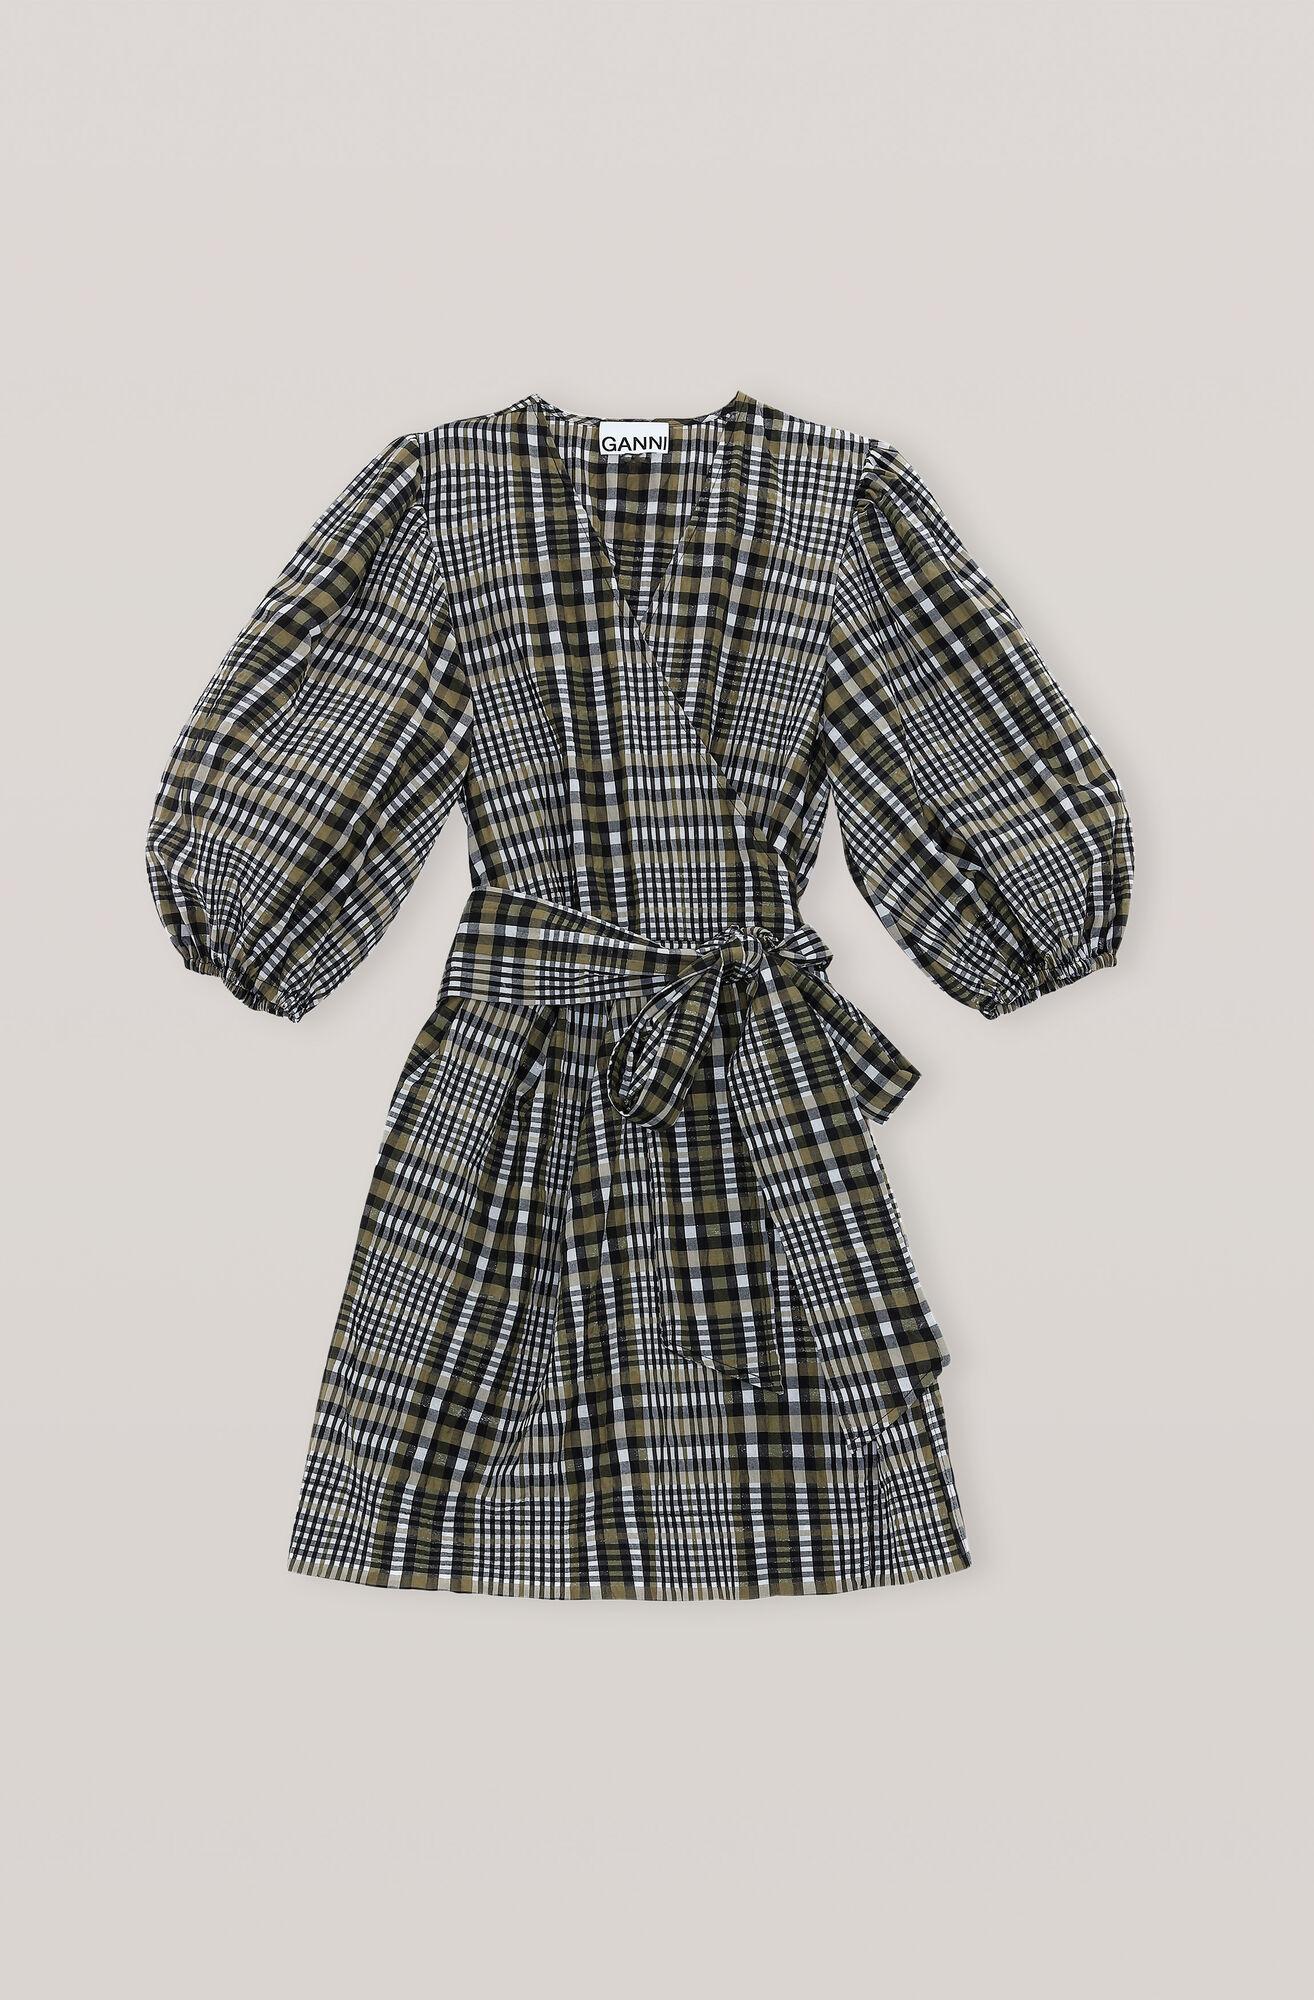 Ganni Us Seersucker Check Wrap Dress 245 00 Usd Shop Your